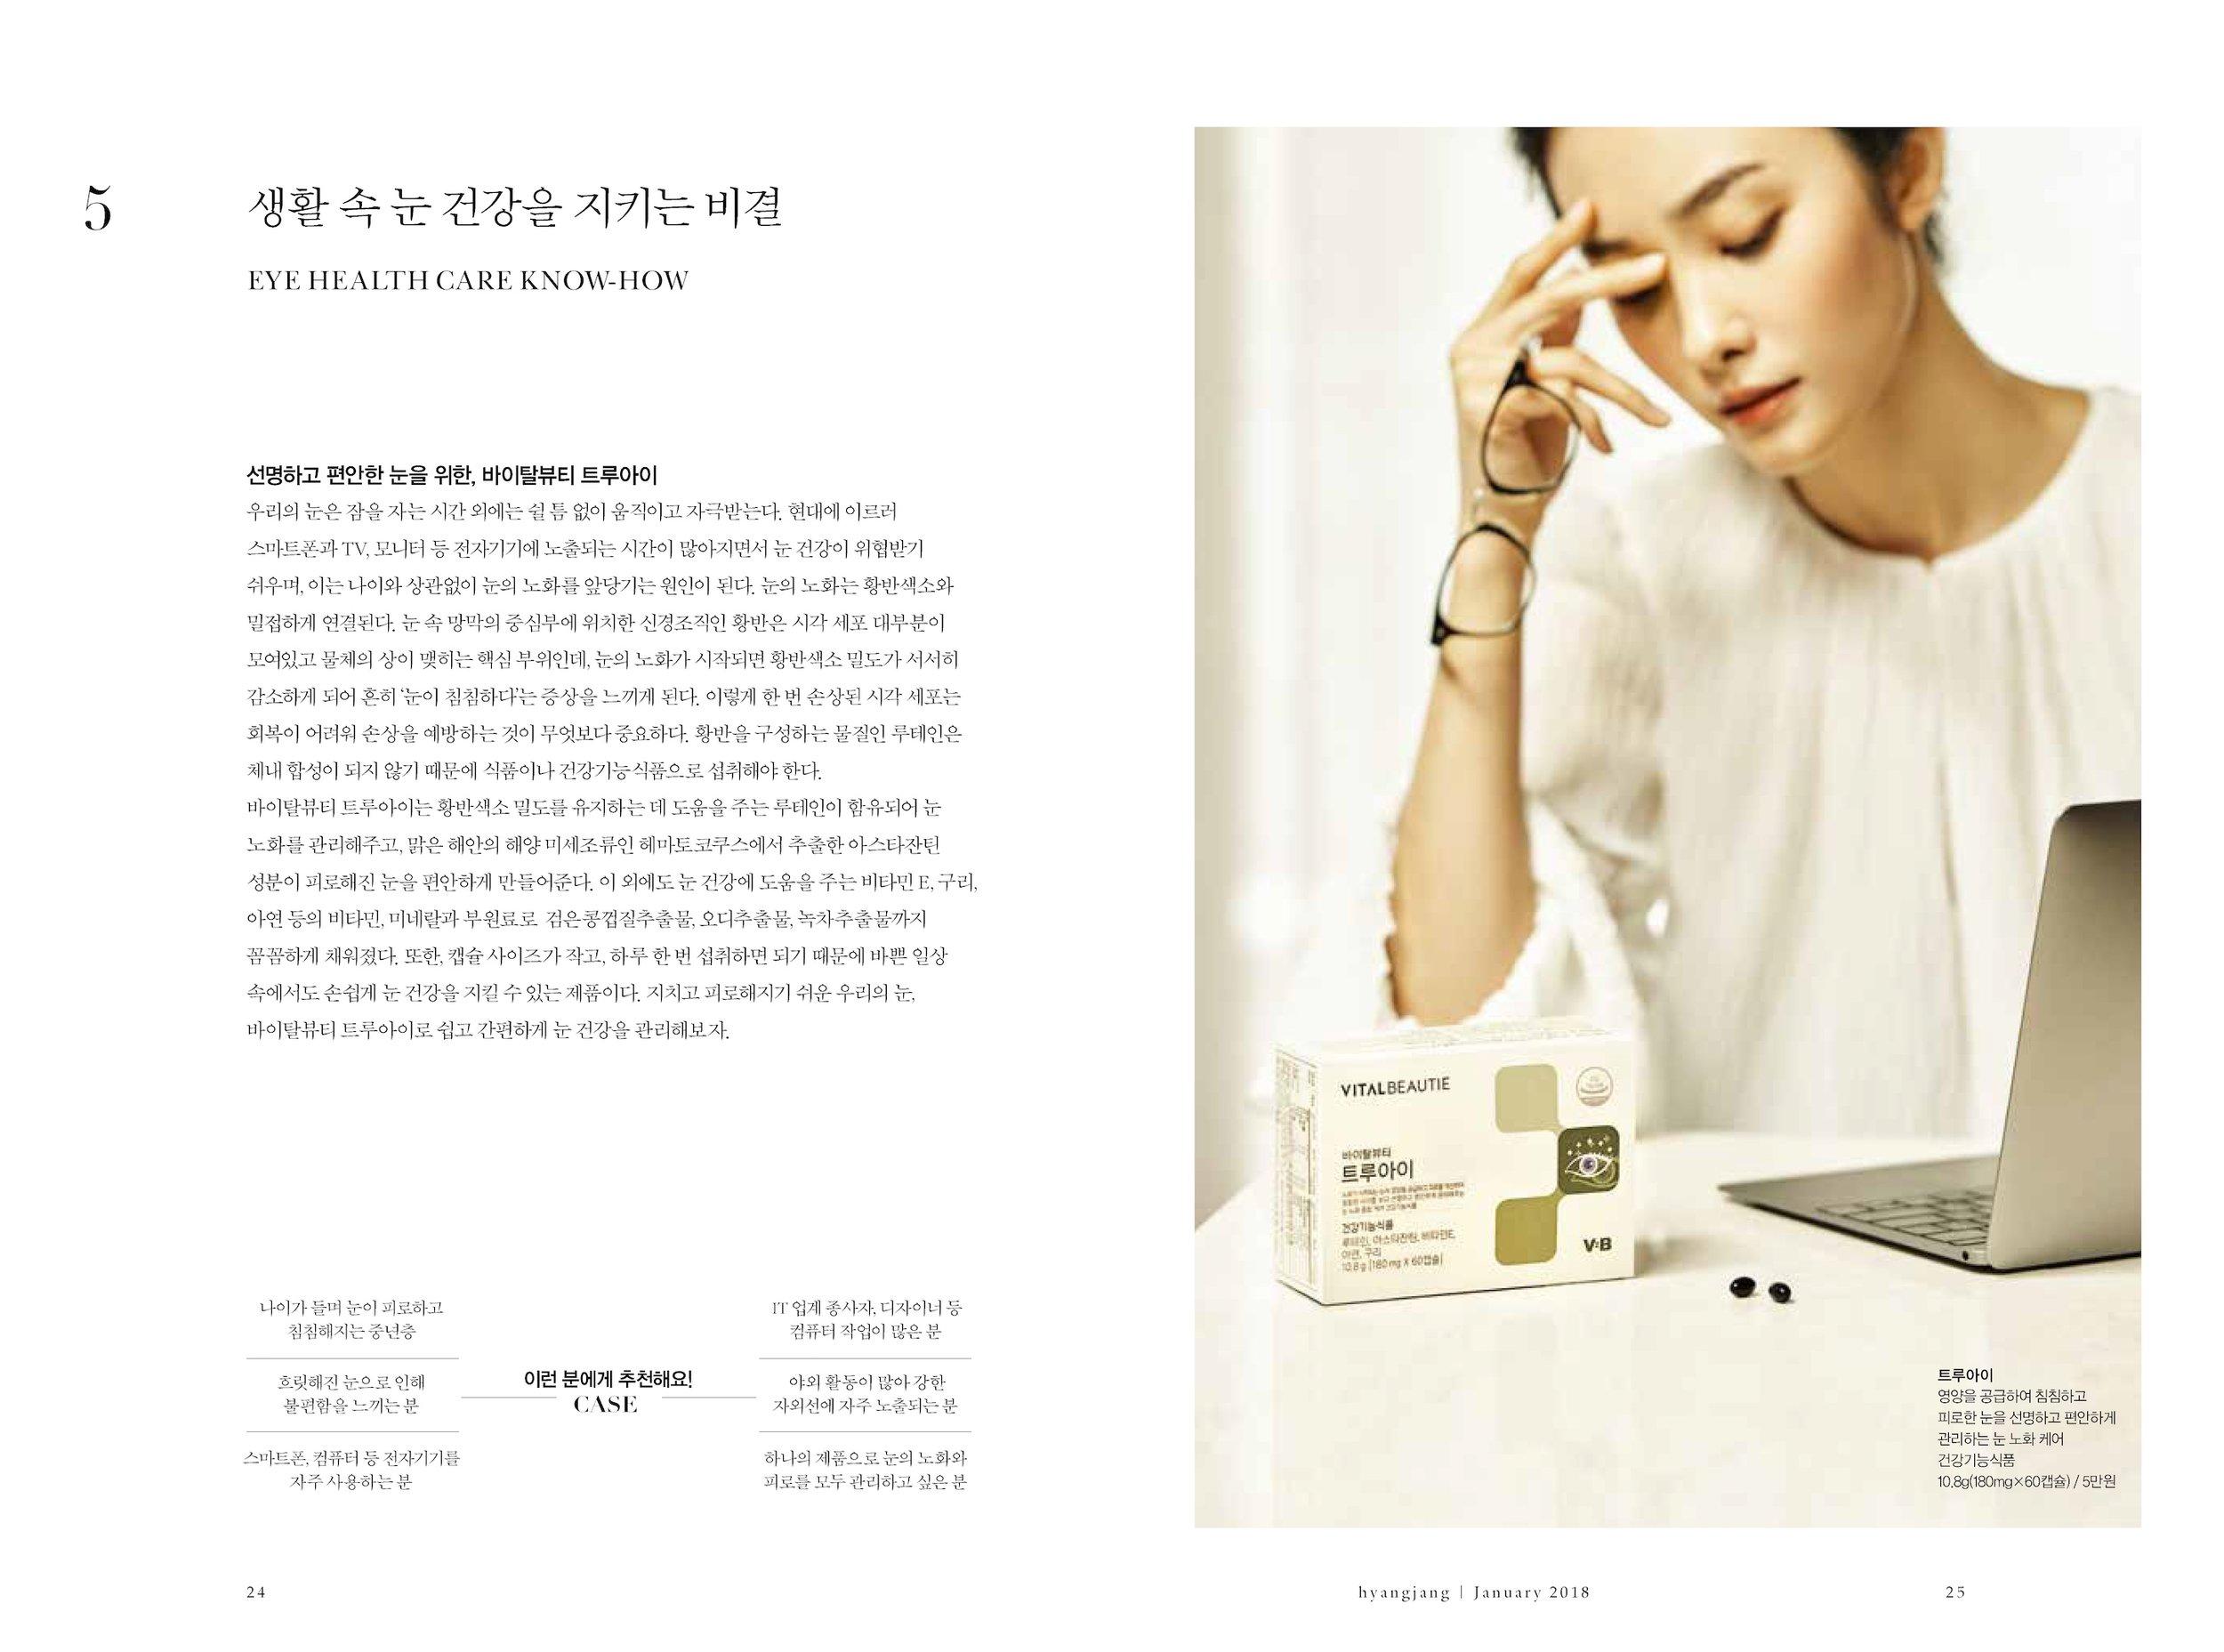 hyangjang-201801_페이지_12.jpeg